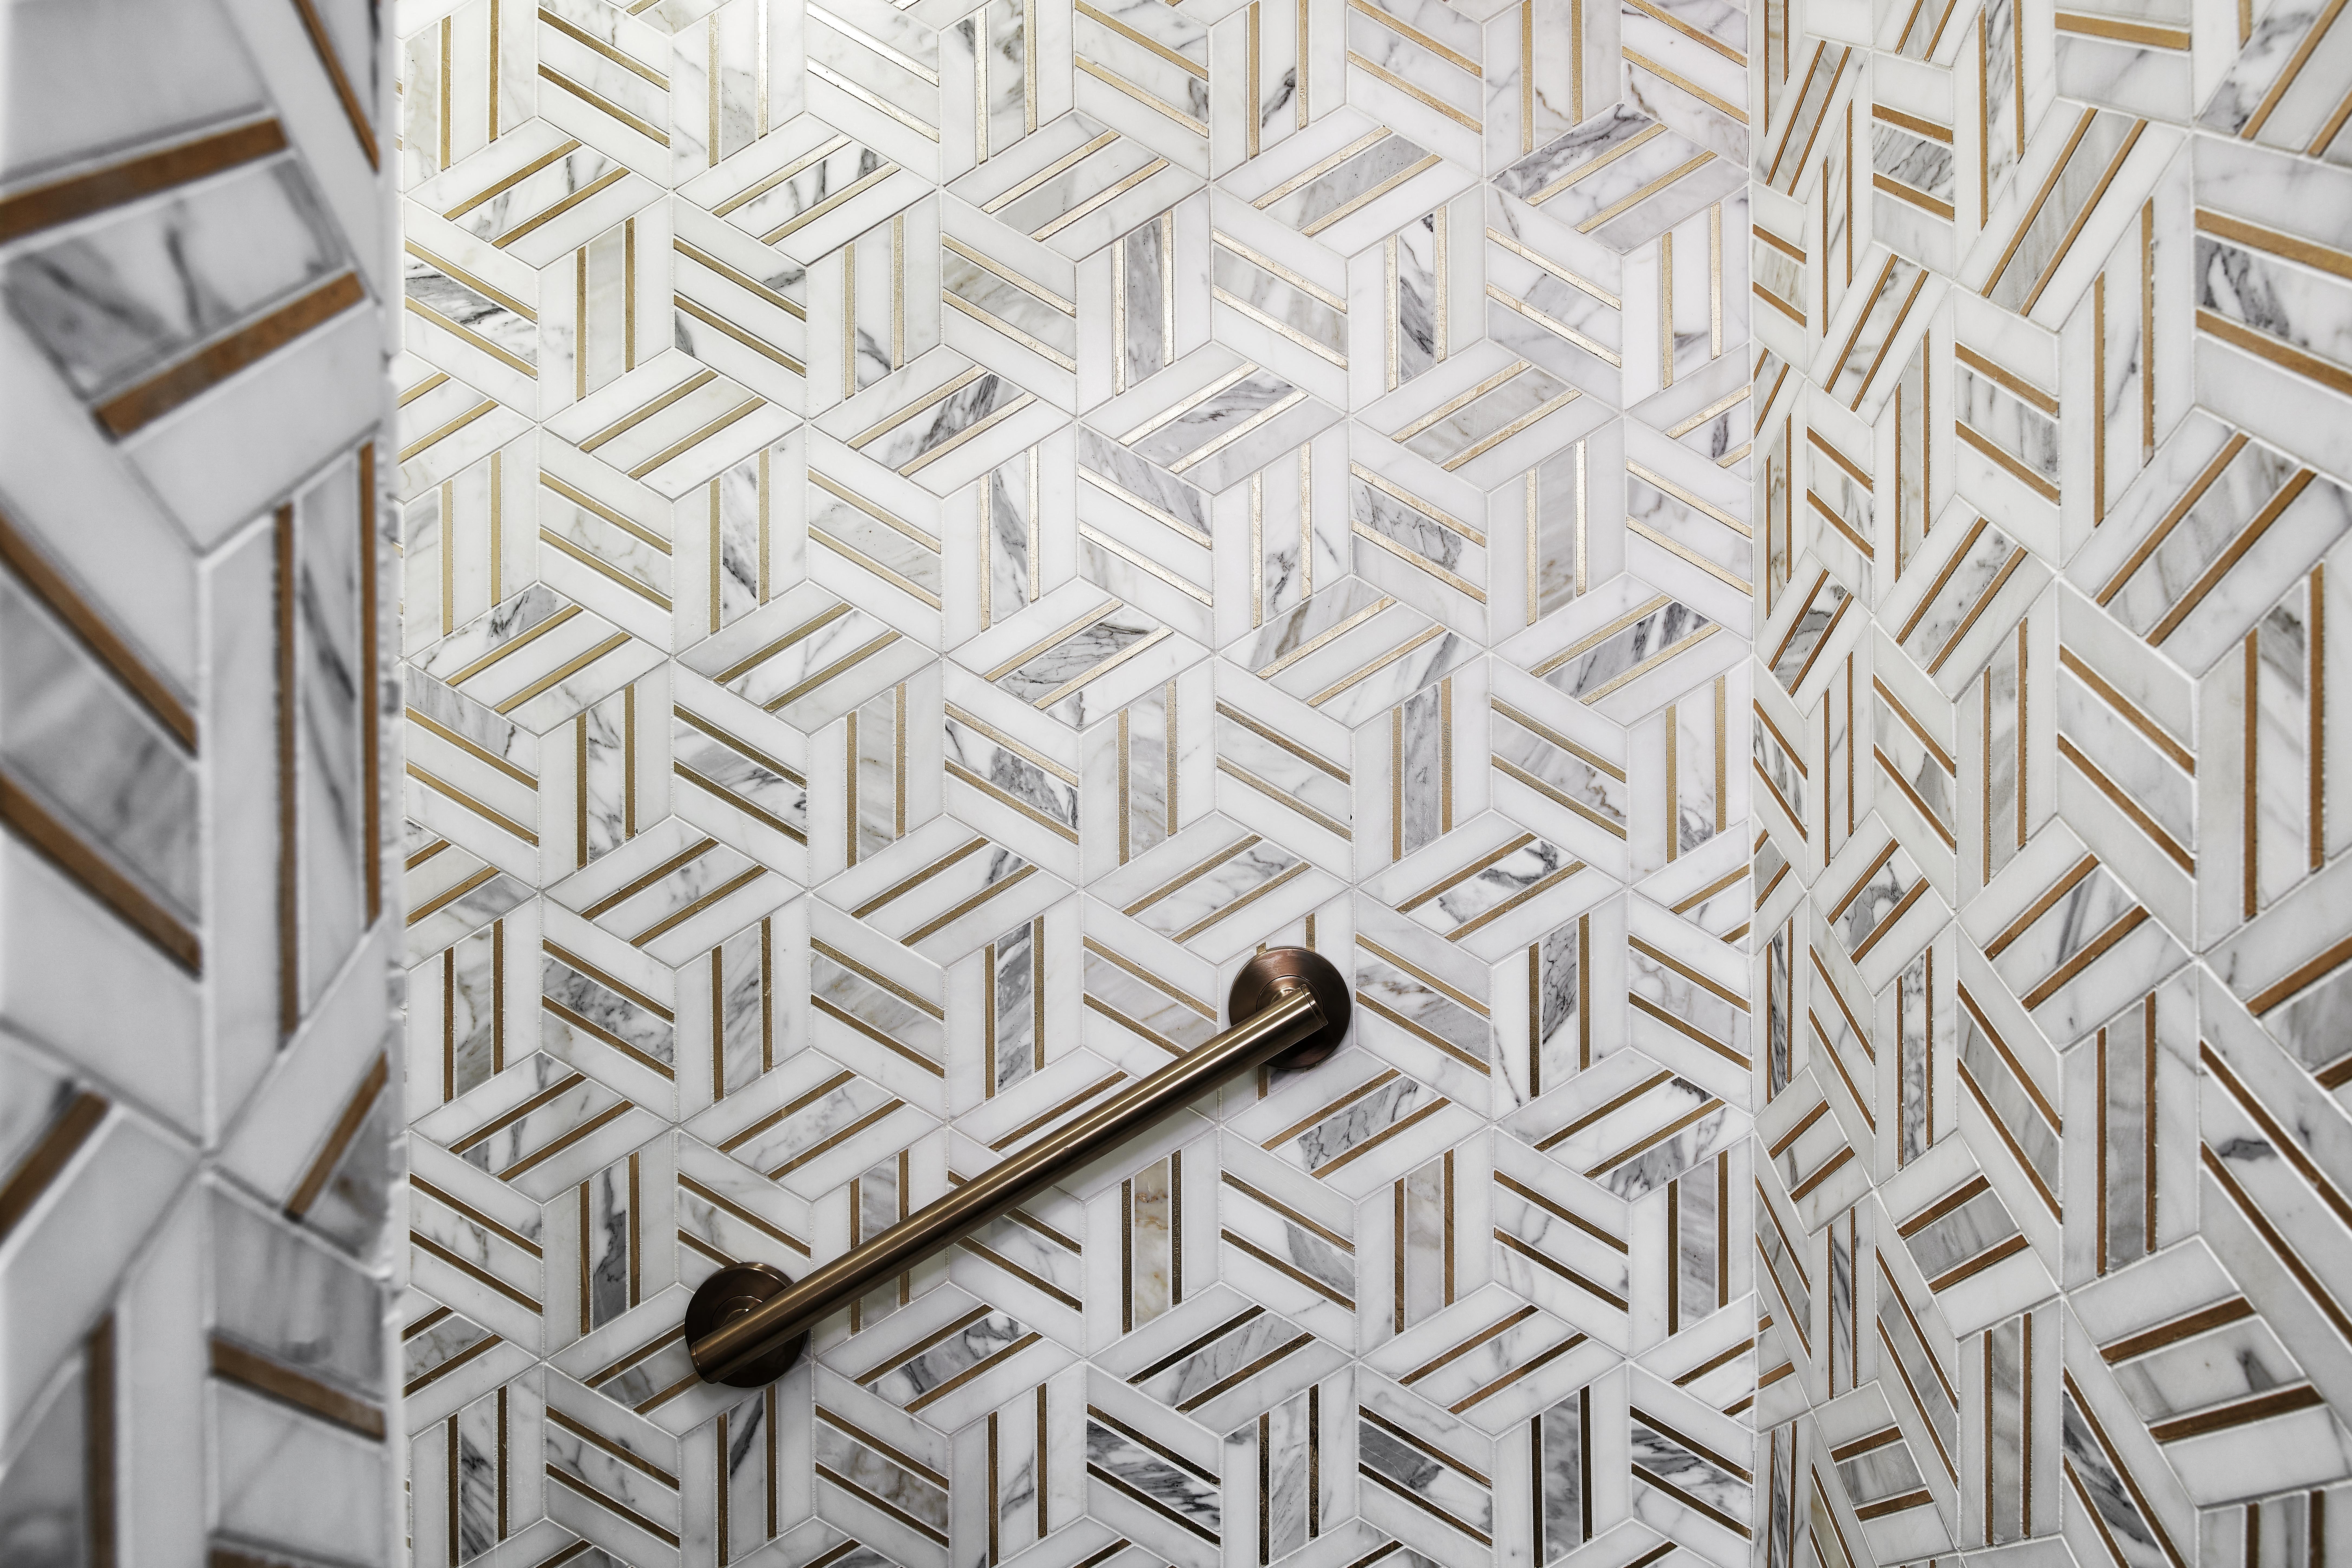 The Kaleidoscope Project, Design: Rydhima Brar, R/terior Studio, Photo SGM Photography